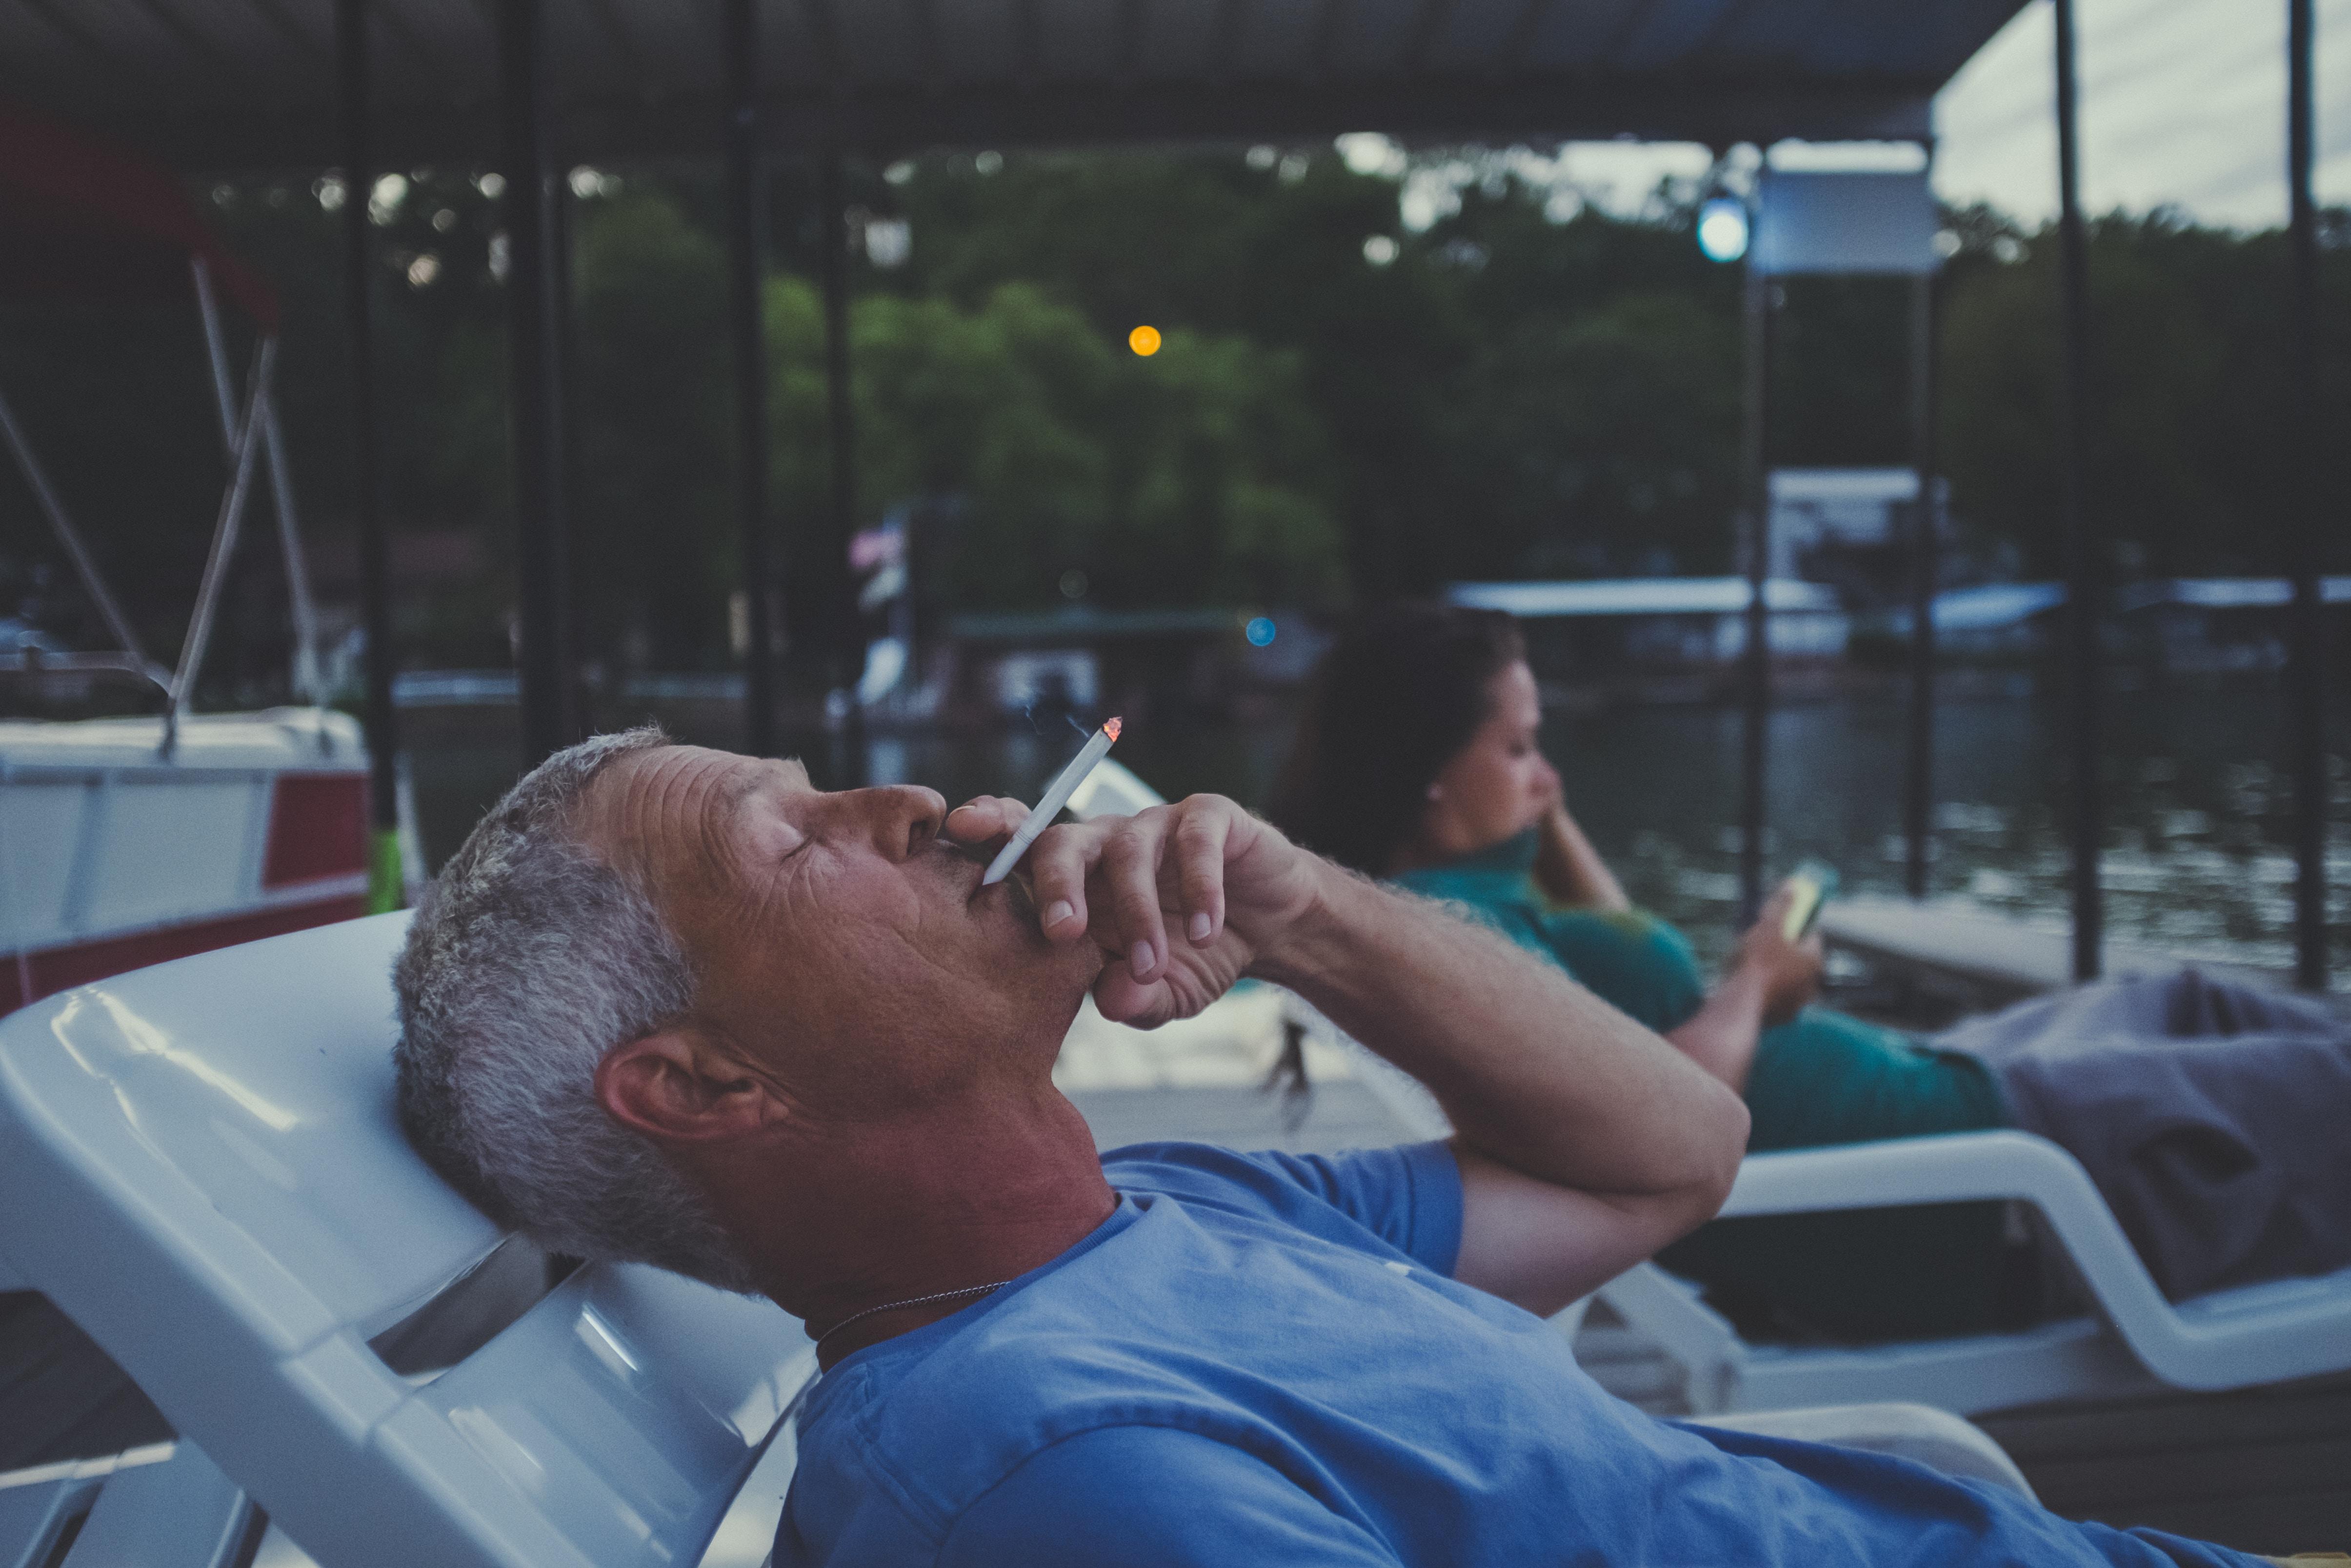 man lying on lounger while smoking cigarette